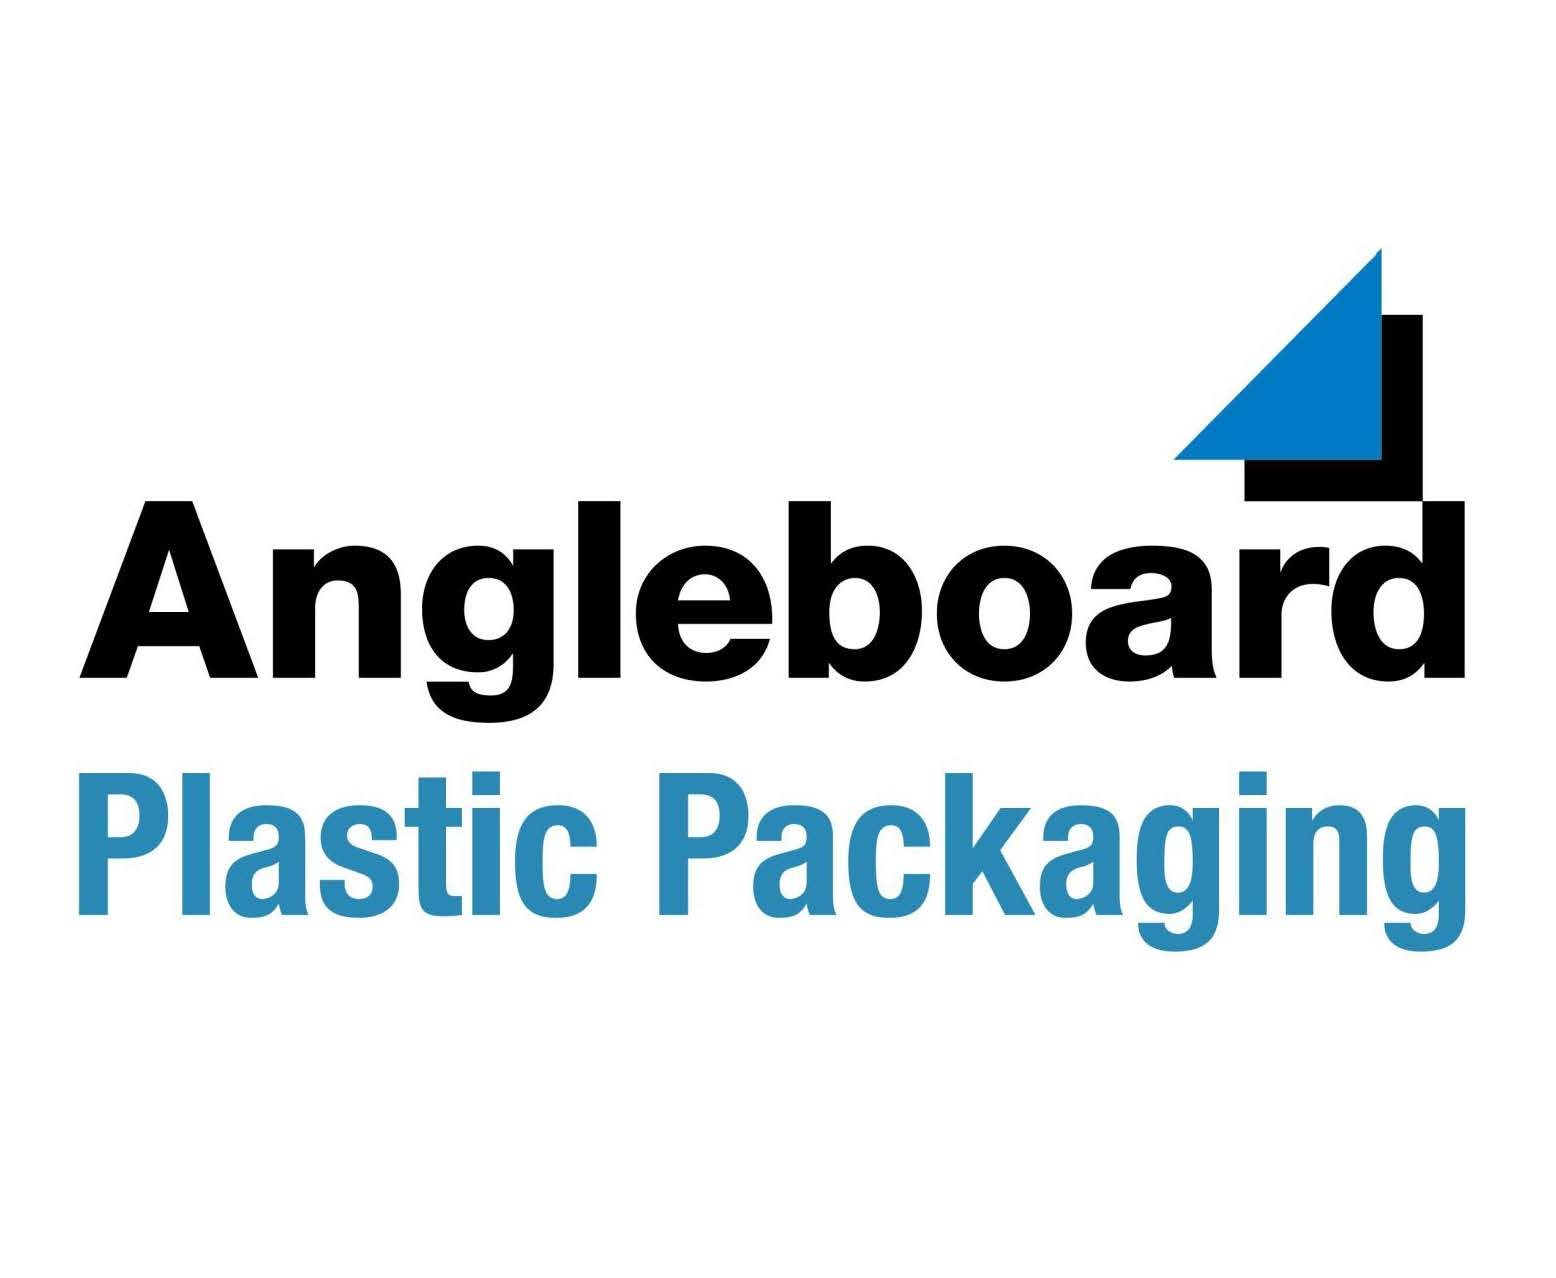 angleboard-plasticpackaging-logo